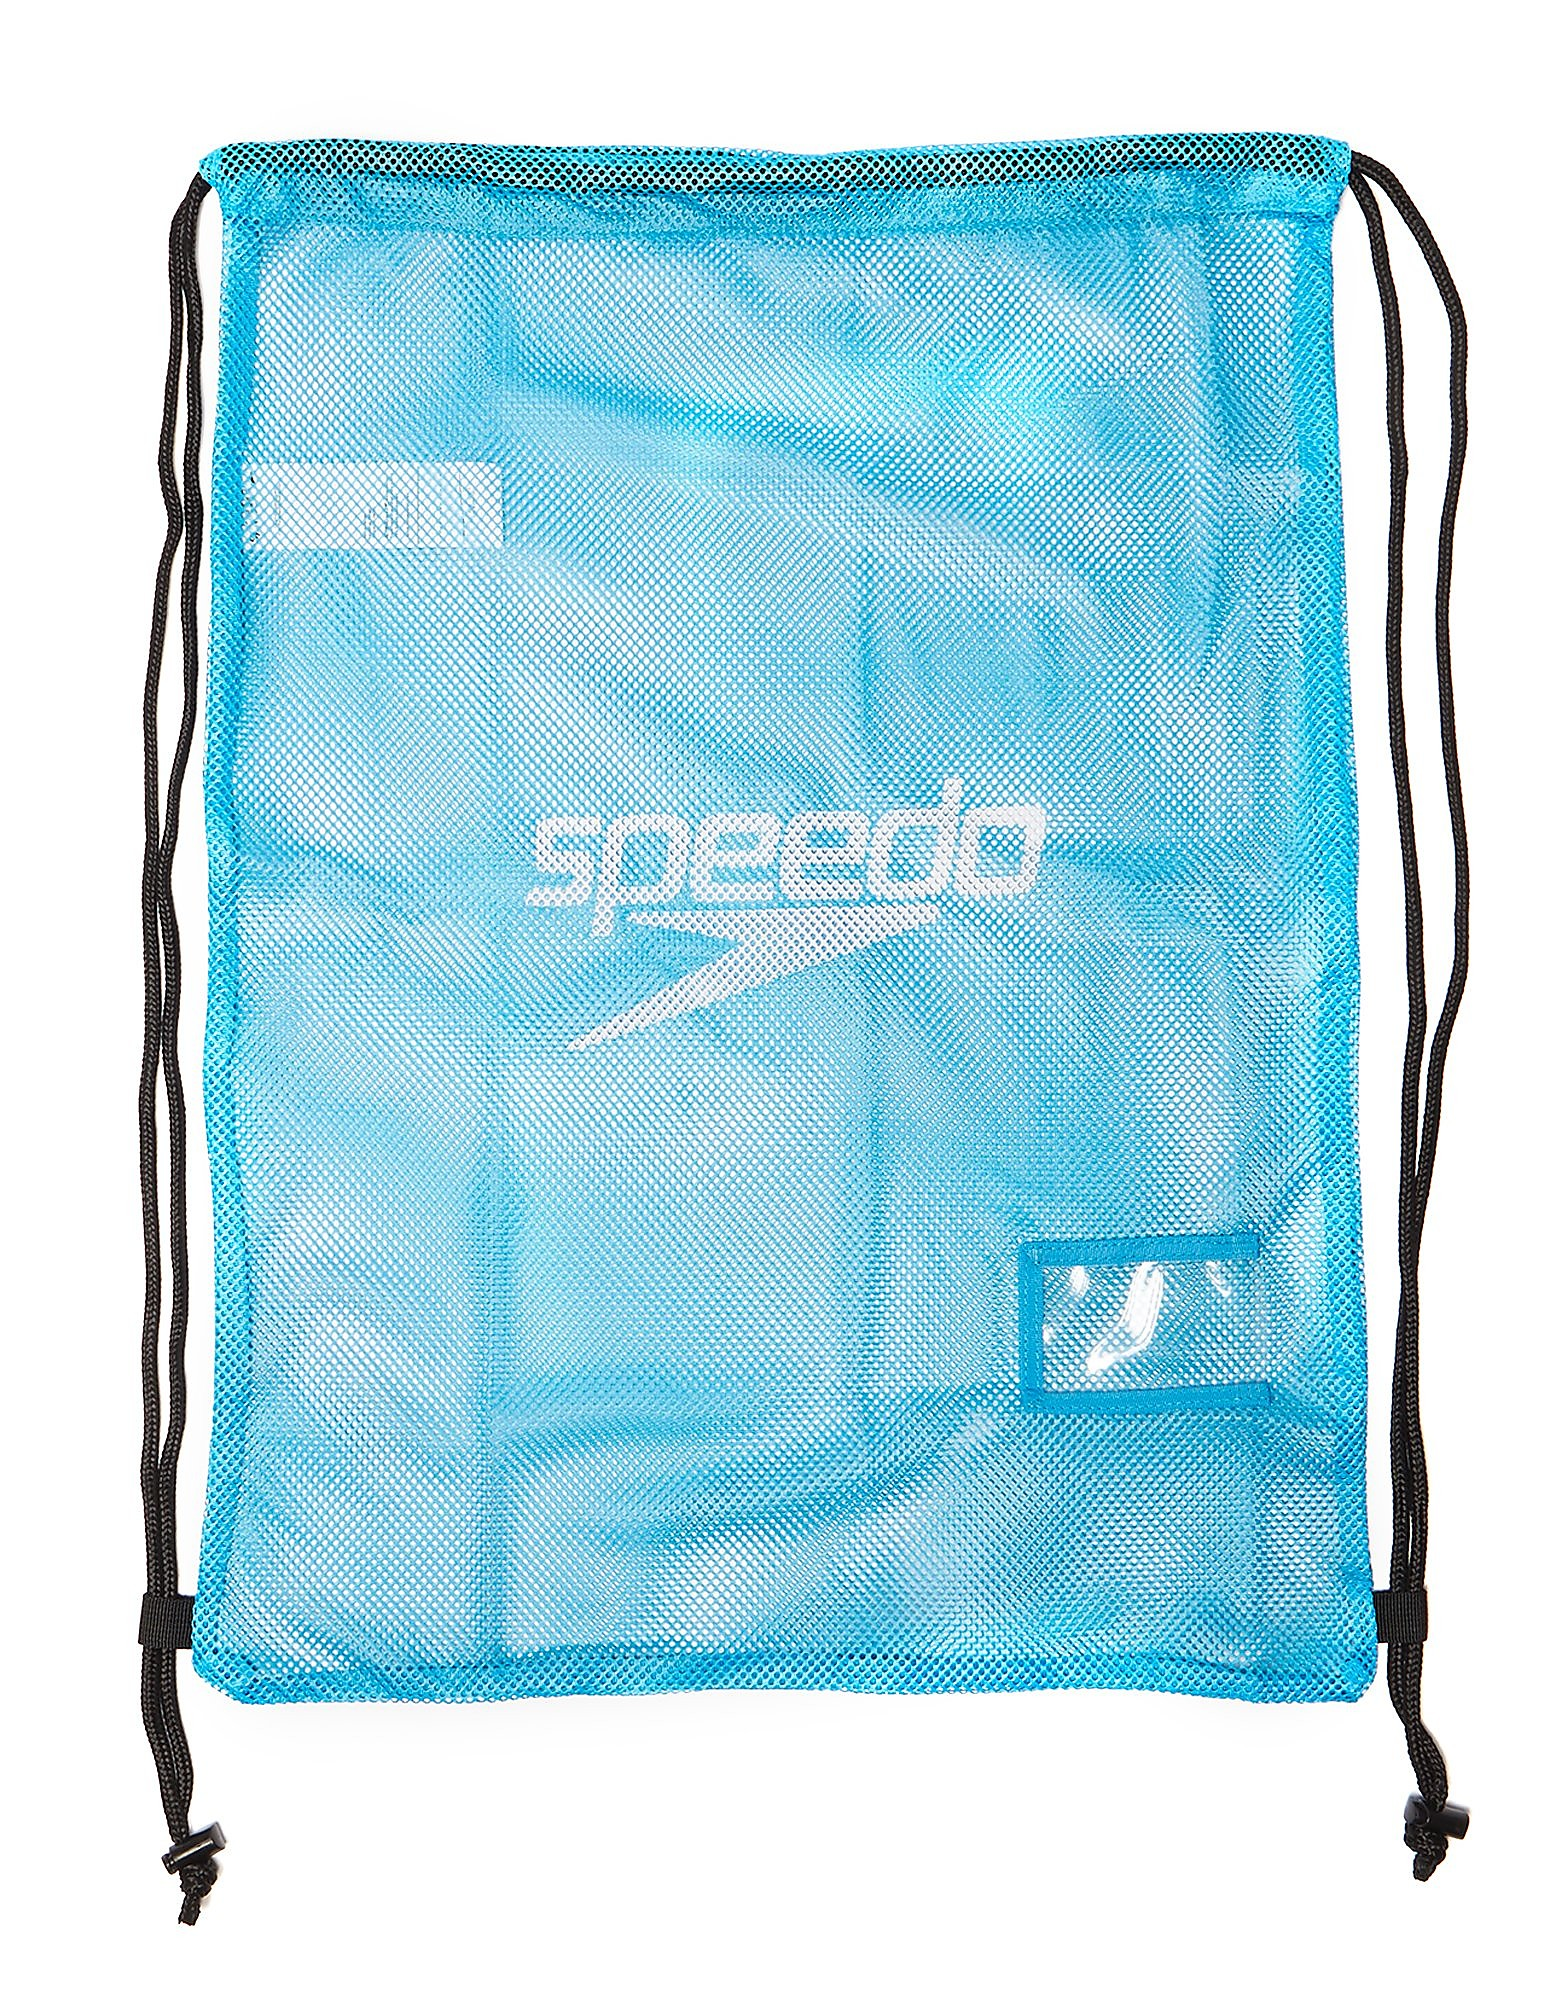 Speedo Equipment Mesh Bag